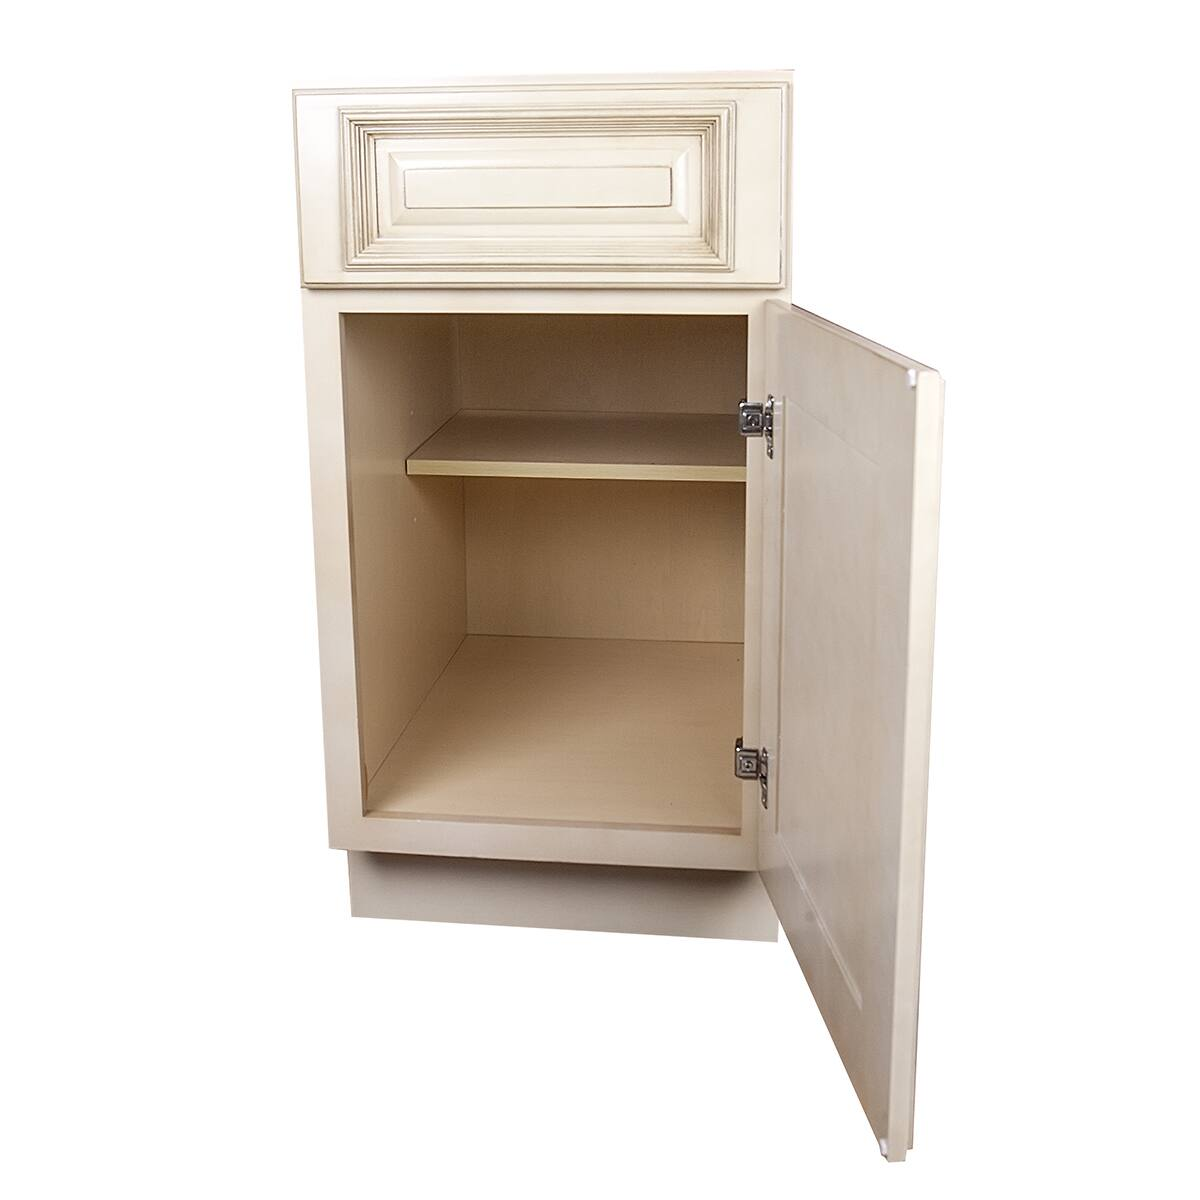 Best Kitchen Cabinet Deals: Buy Kitchen Cabinets Online At Overstock.com